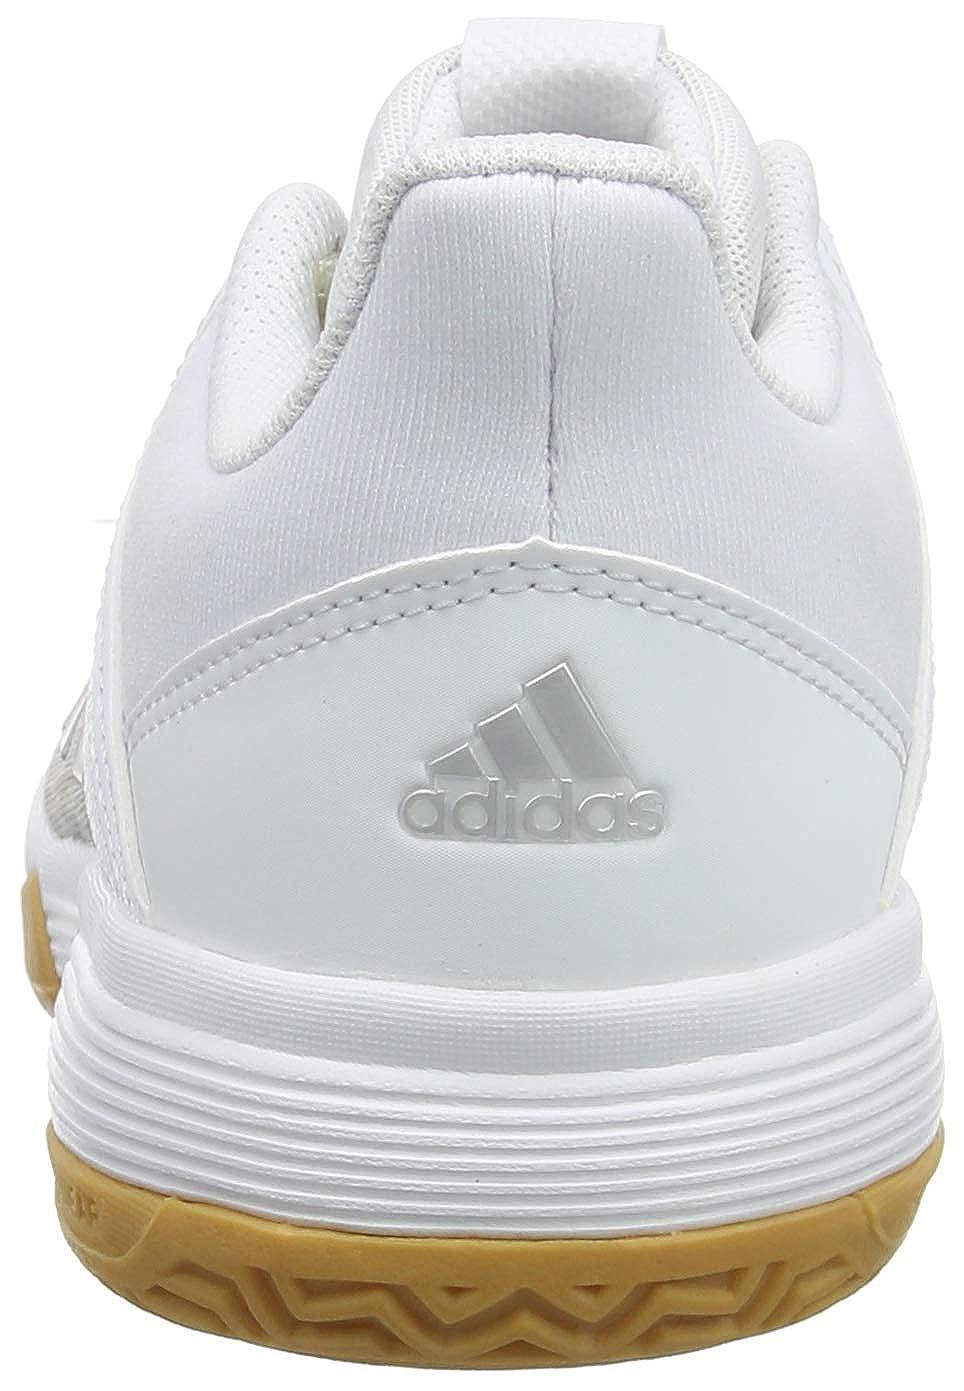 Adidas Damen Ligra 6 Volleyballschuhe B07DB5NLCG Volleyballschuhe Spezielle Funktion Funktion Funktion 7e9005